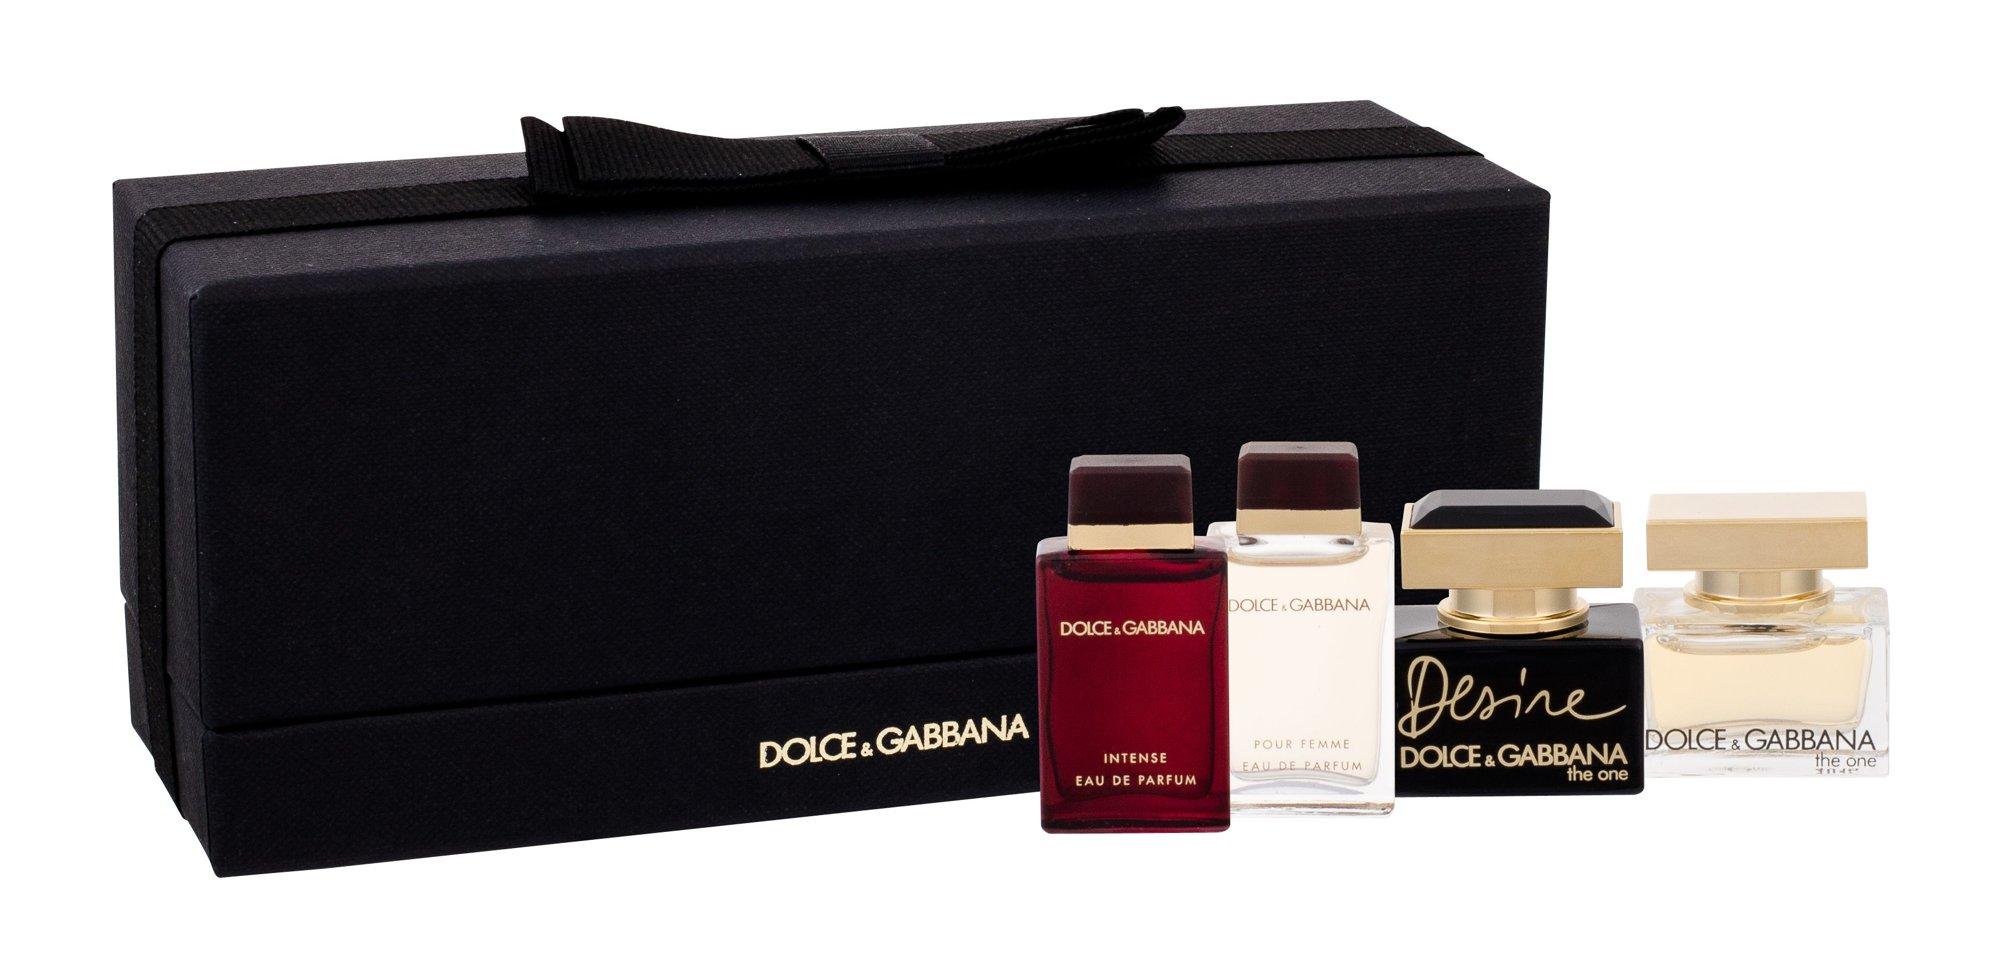 Dolce&Gabbana Mini Set Eau de Parfum 19ml